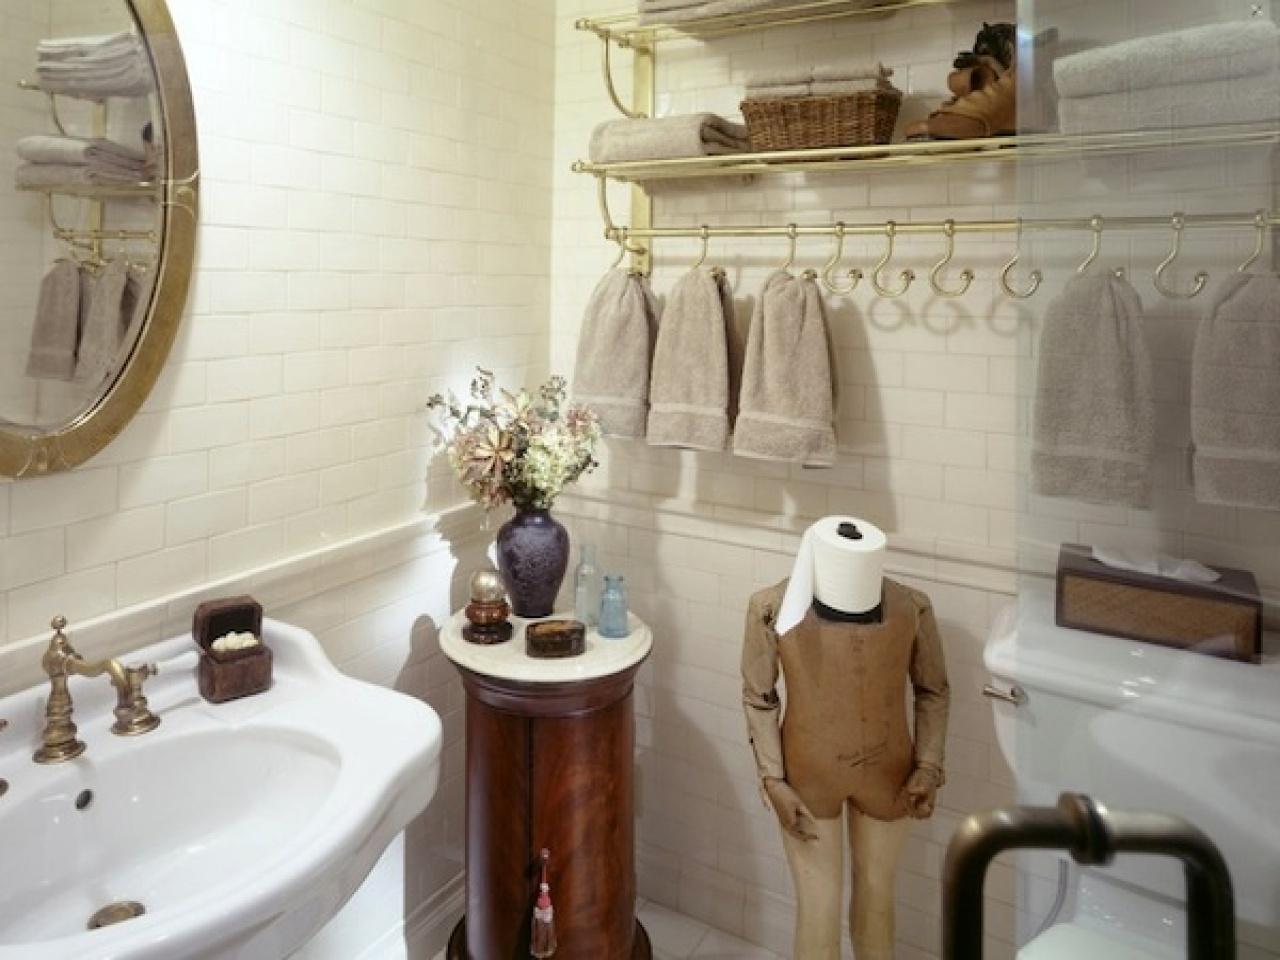 bathroom-towel-decorating-ideas-bathroom-towel-rack-ideas-6cce875871be4eaf